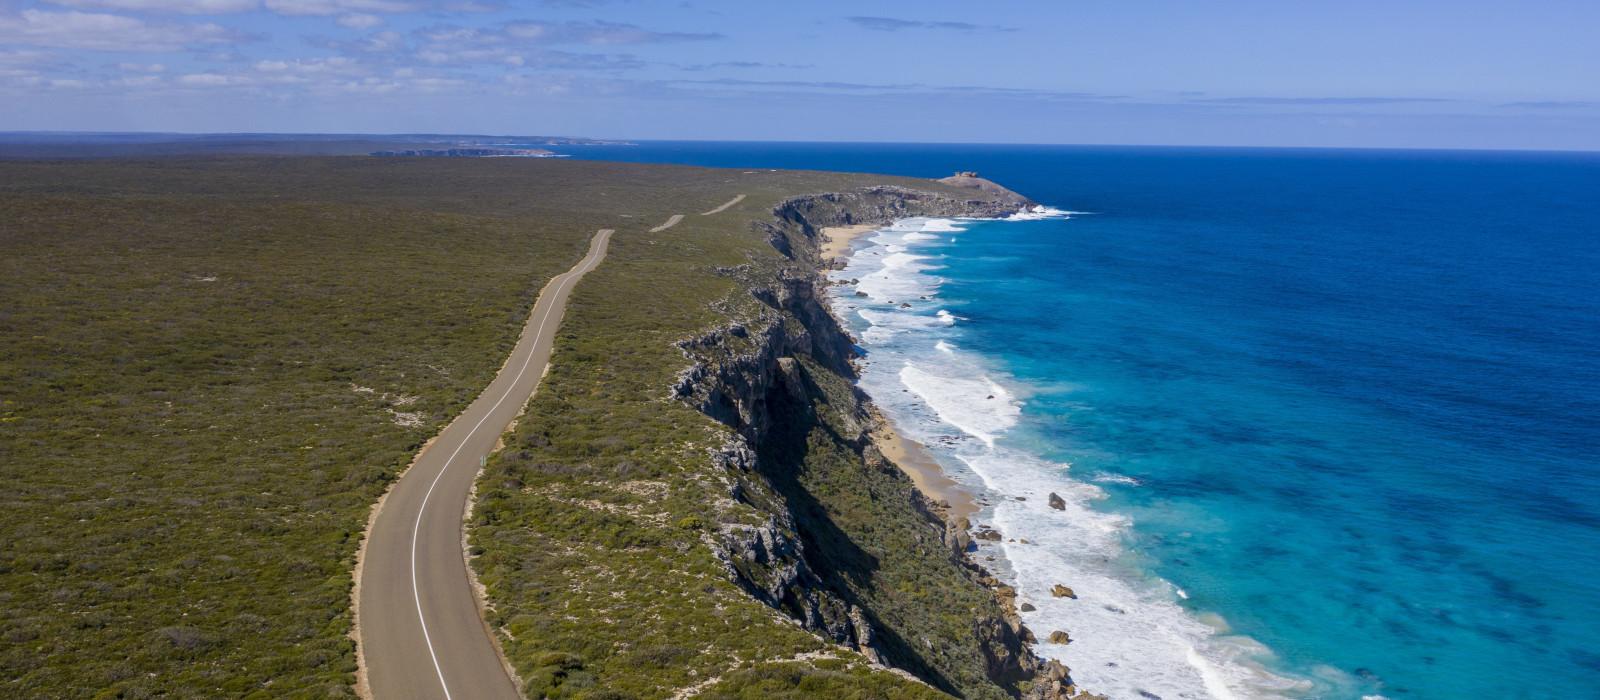 Destination Apollo Bay Australia